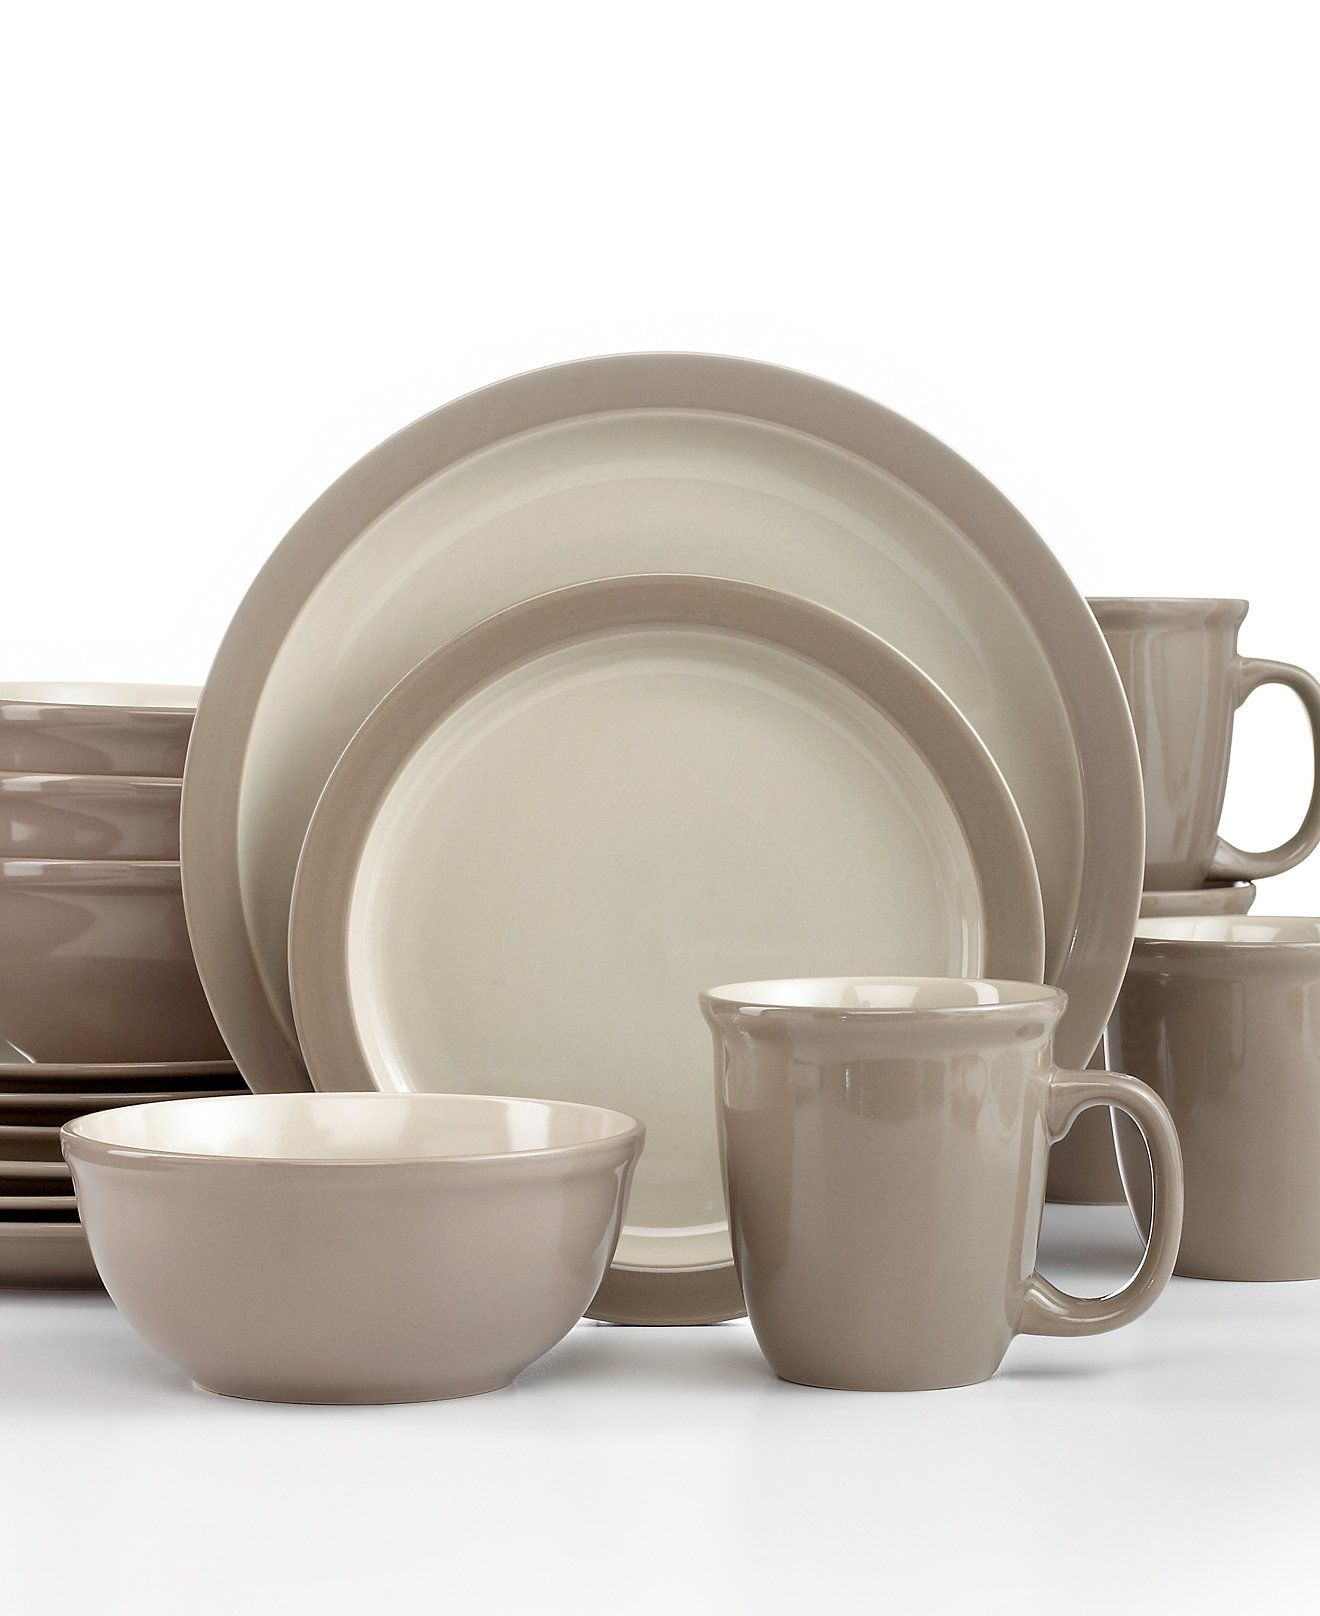 Thomson Pottery Mali Sesame 16-Pc. Set Service for 4 - Dinnerware -  sc 1 st  Pinterest & Thomson Pottery Mali Sesame 16-Pc. Set Service for 4 - Dinnerware ...